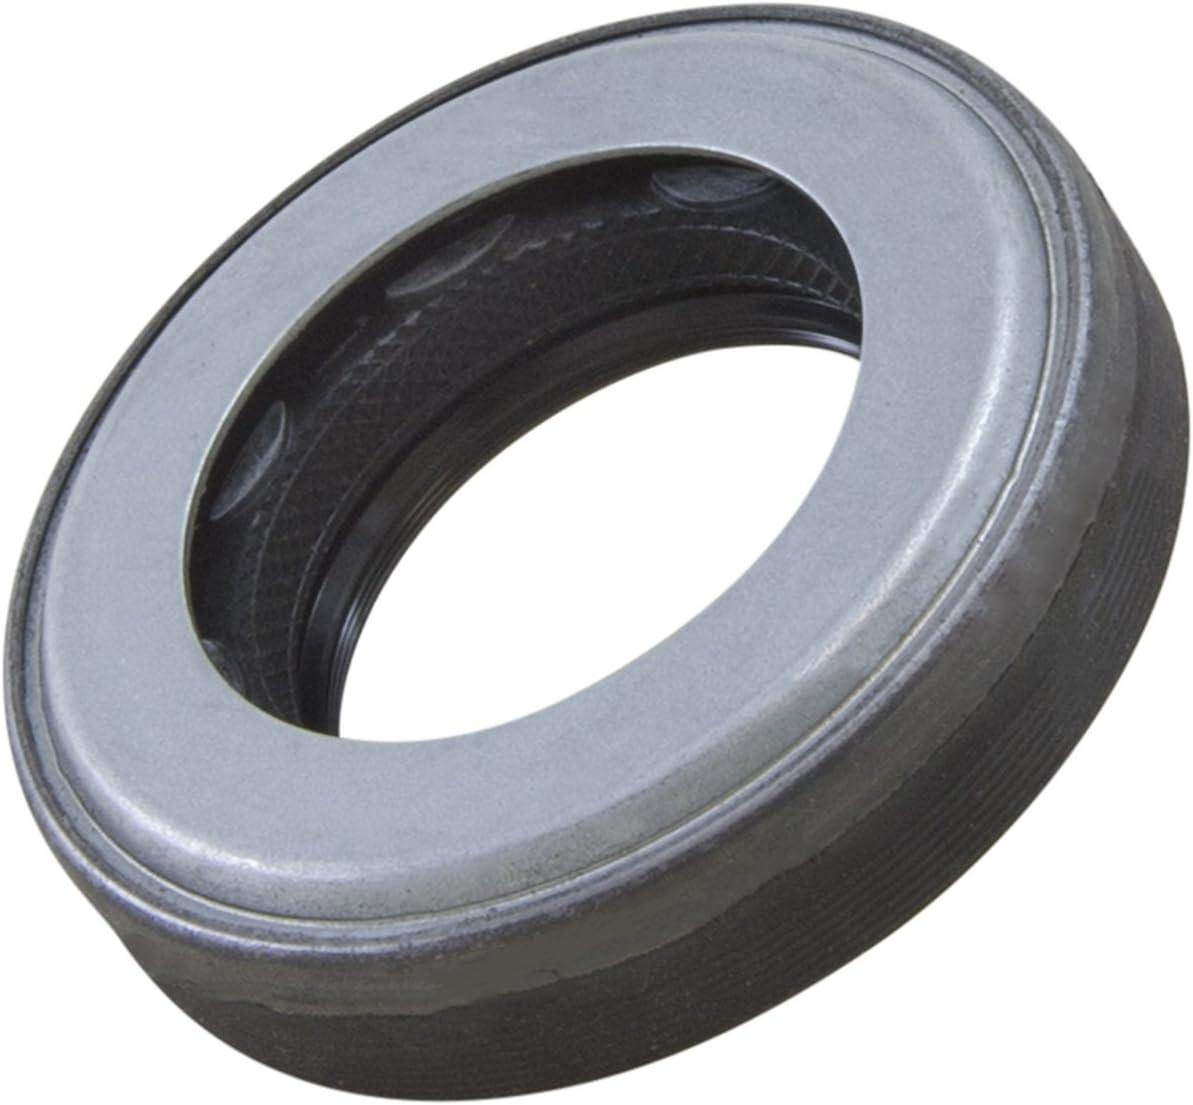 Yukon YMSG1026 Left Stub Axle Seal for lowest price Regular store 7.2